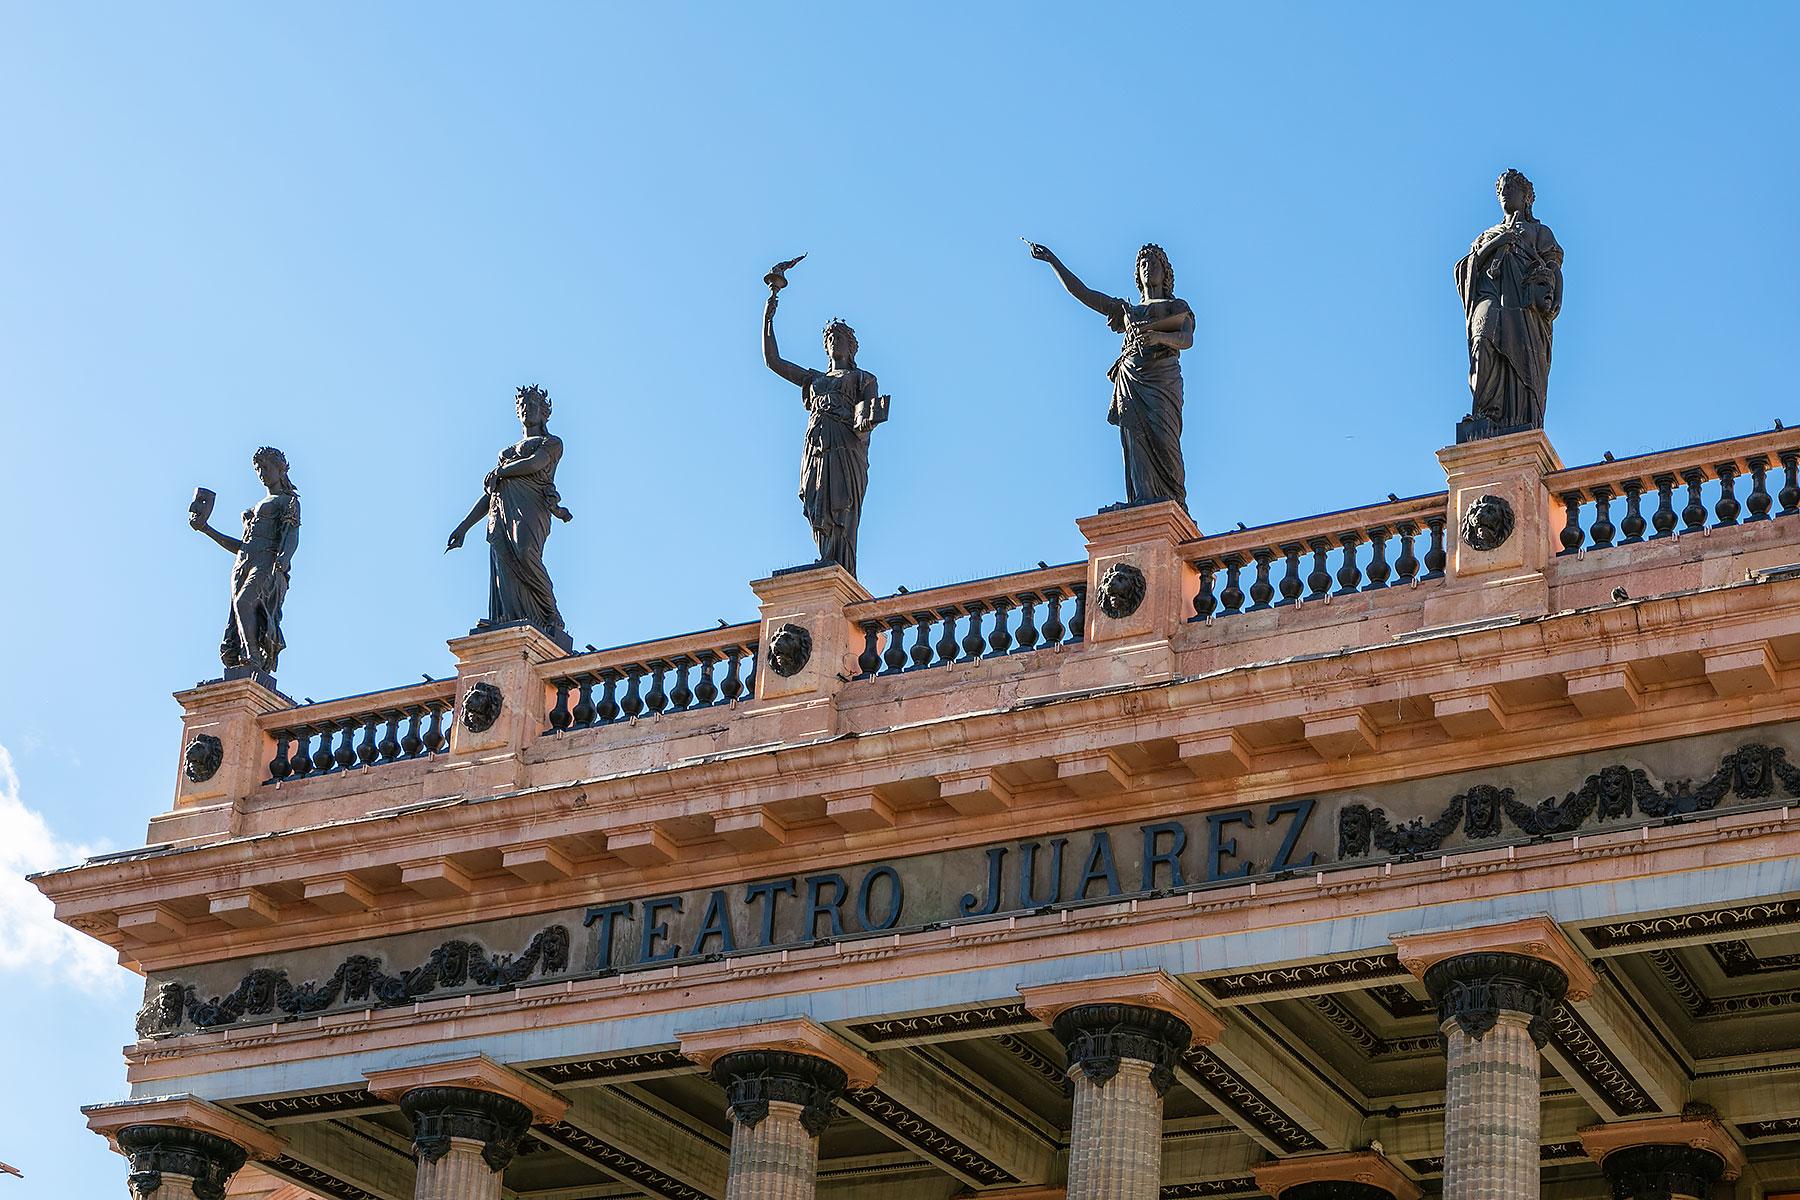 Guanajuato-2004.jpg